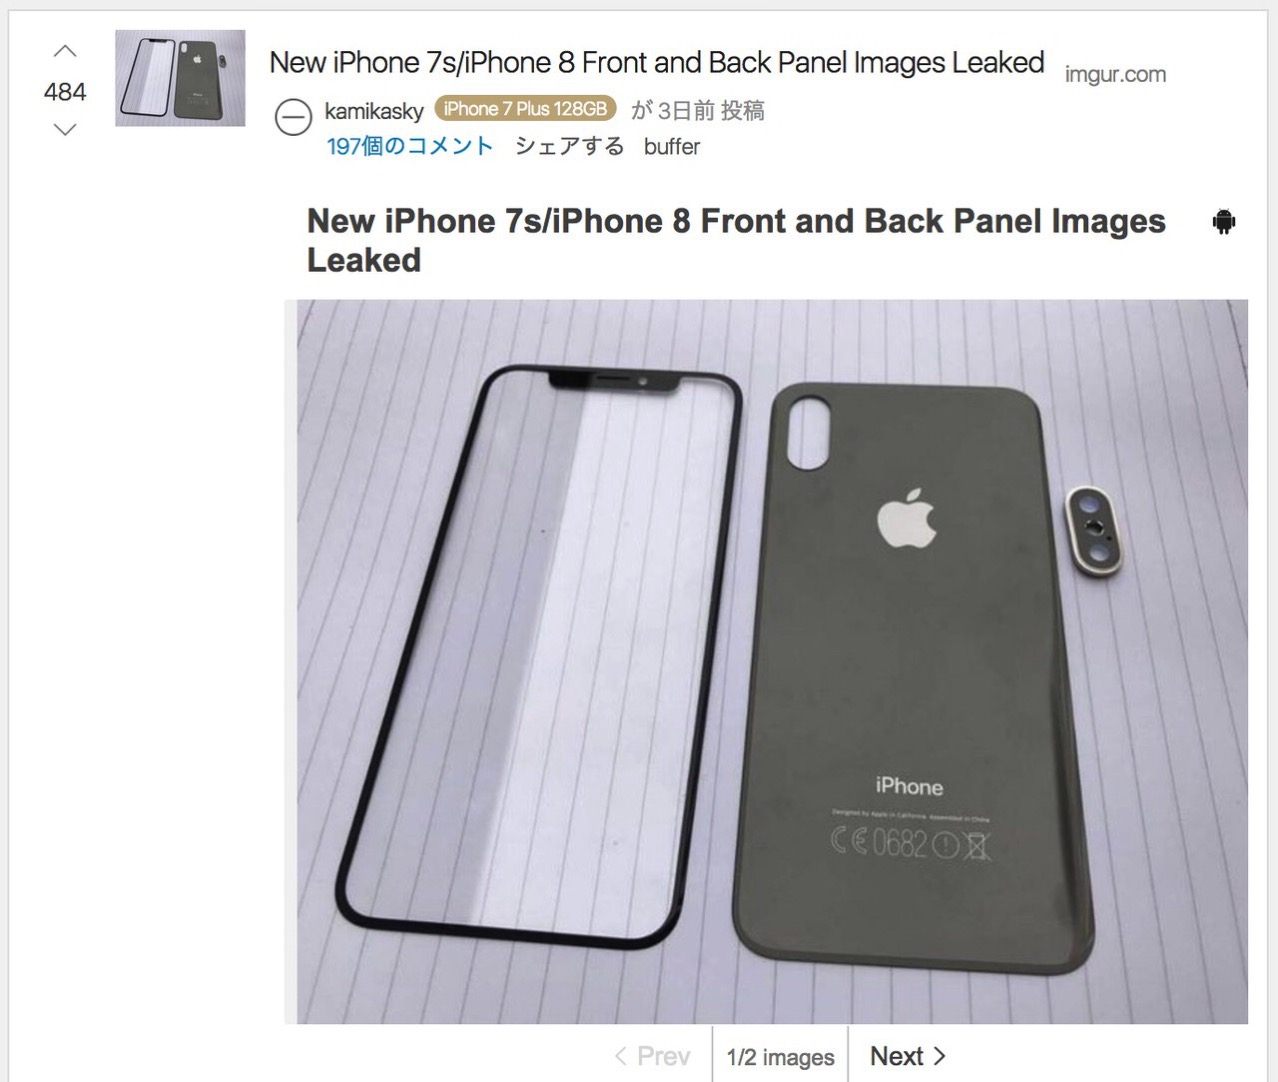 【iPhone 8】フロントとバックのパネルのリーク写真が公開される